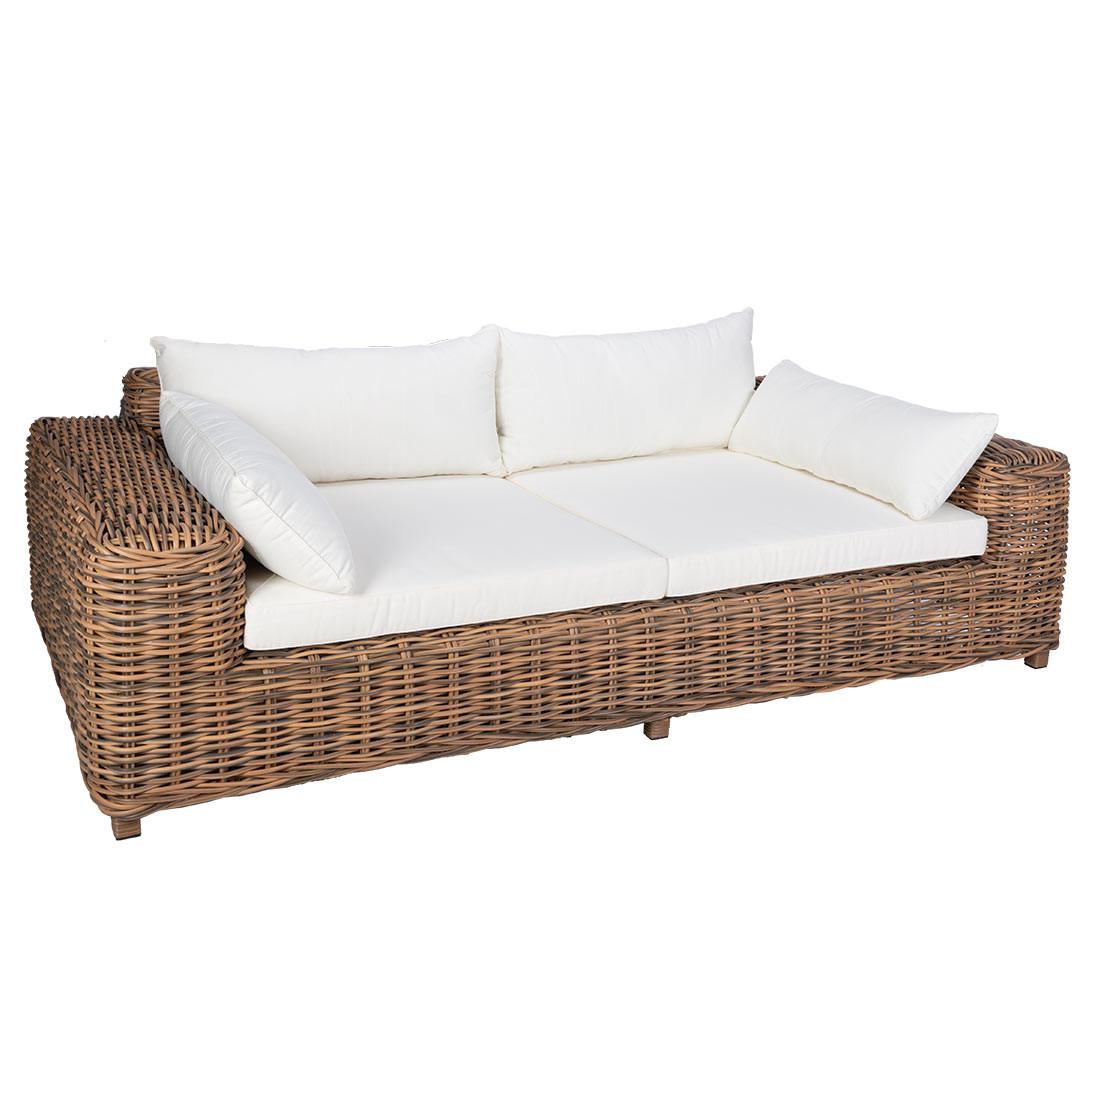 Full Size of Polyrattan Sofa 2 Sitzer Balkon Couch Grau Gartensofa Tchibo Garden Set Lounge Rattan Outdoor Outliv Versailles Luxury Geflecht Garten Und Freizeit Sofa Polyrattan Sofa